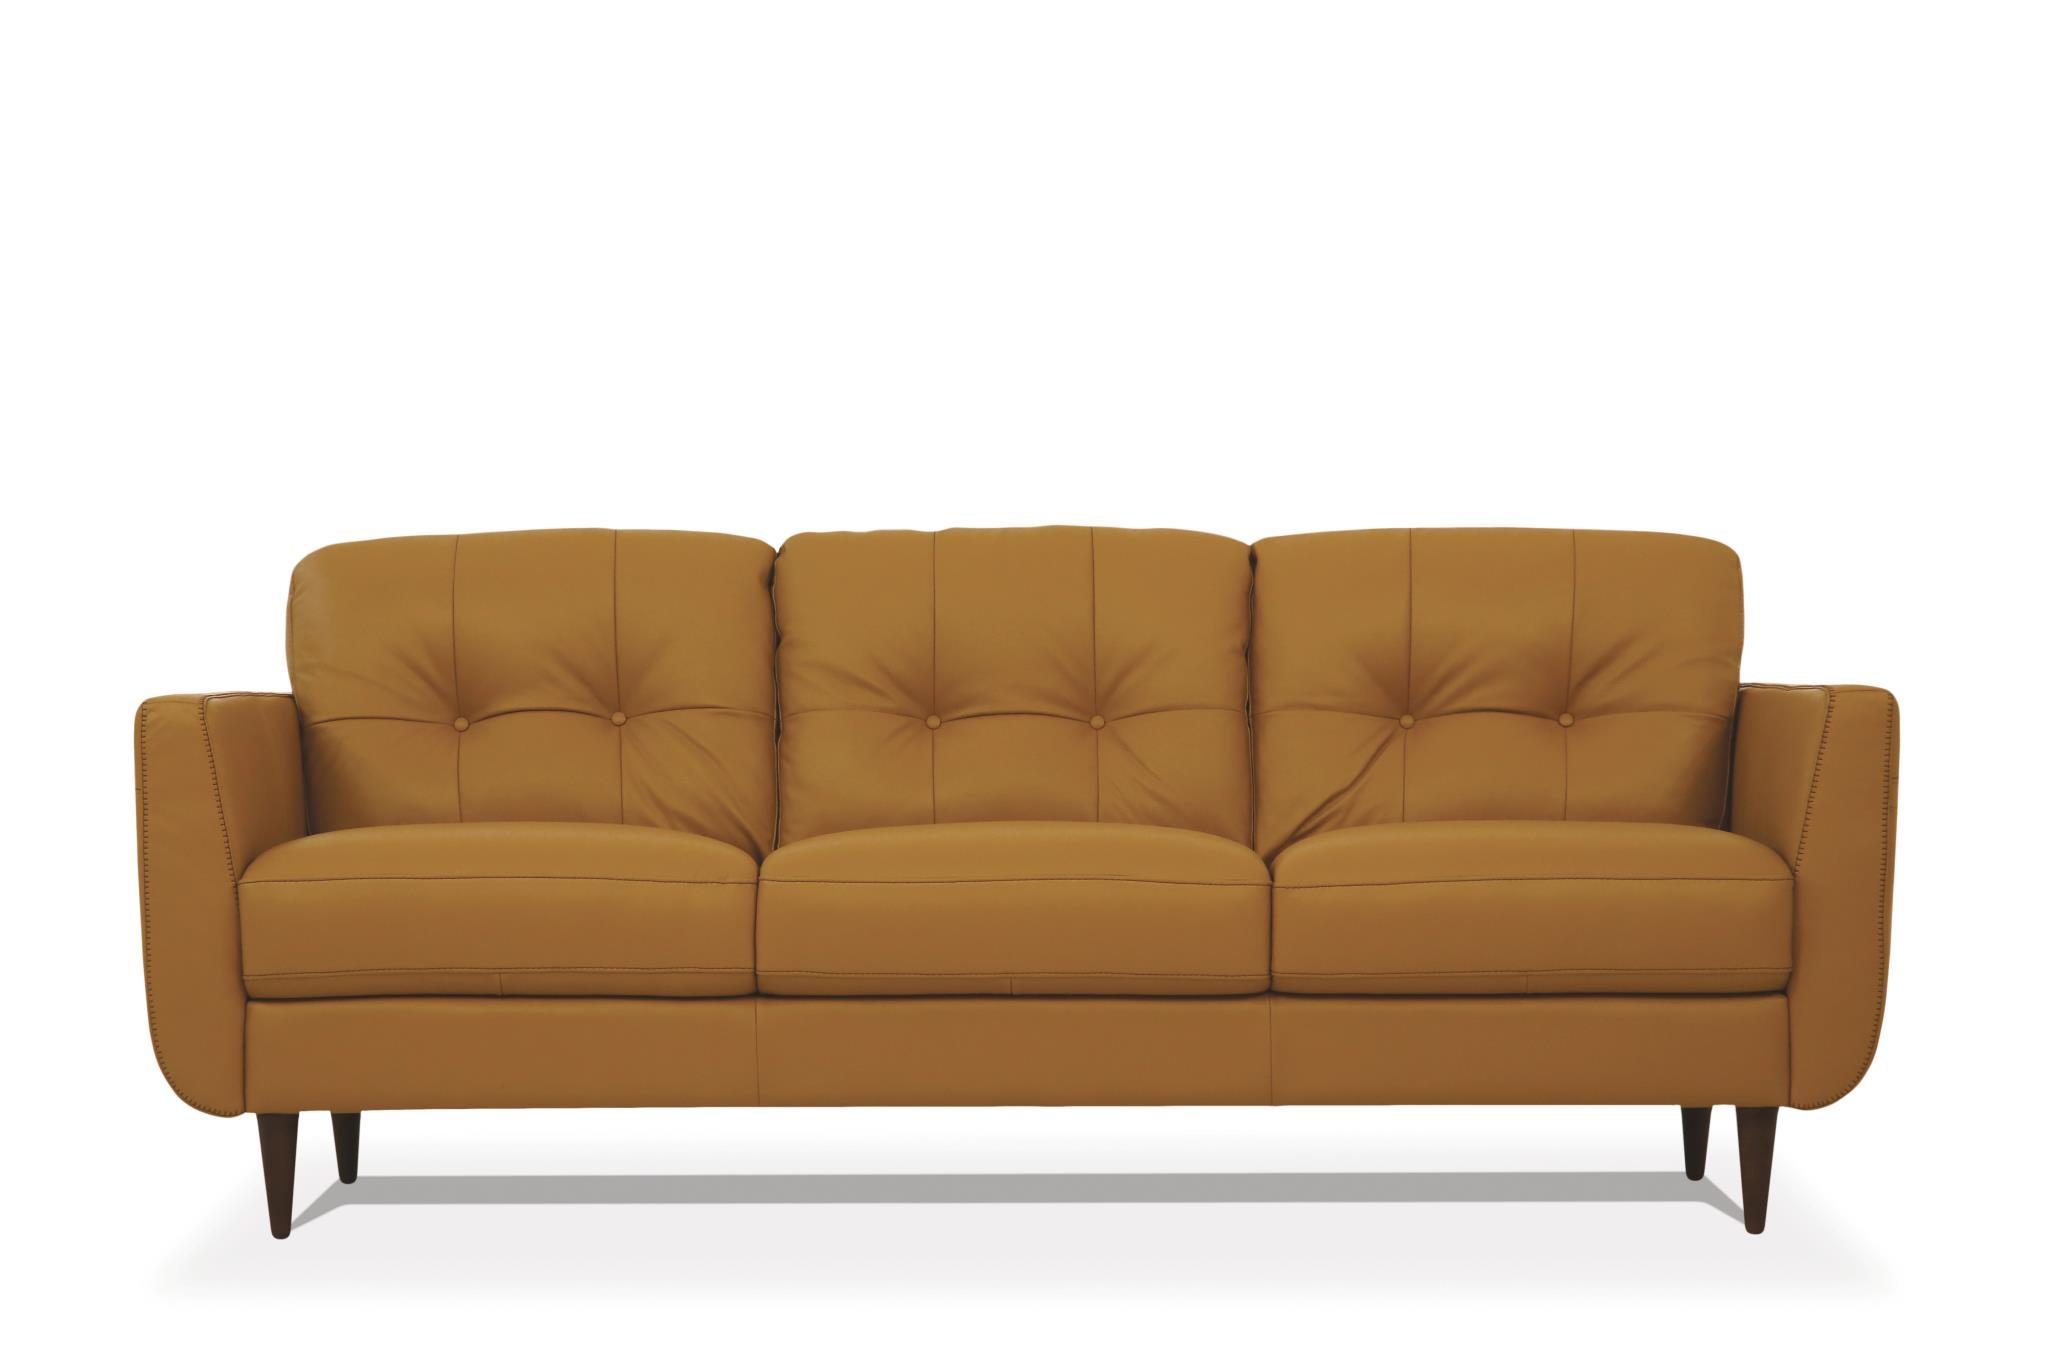 Camel Sofa Front